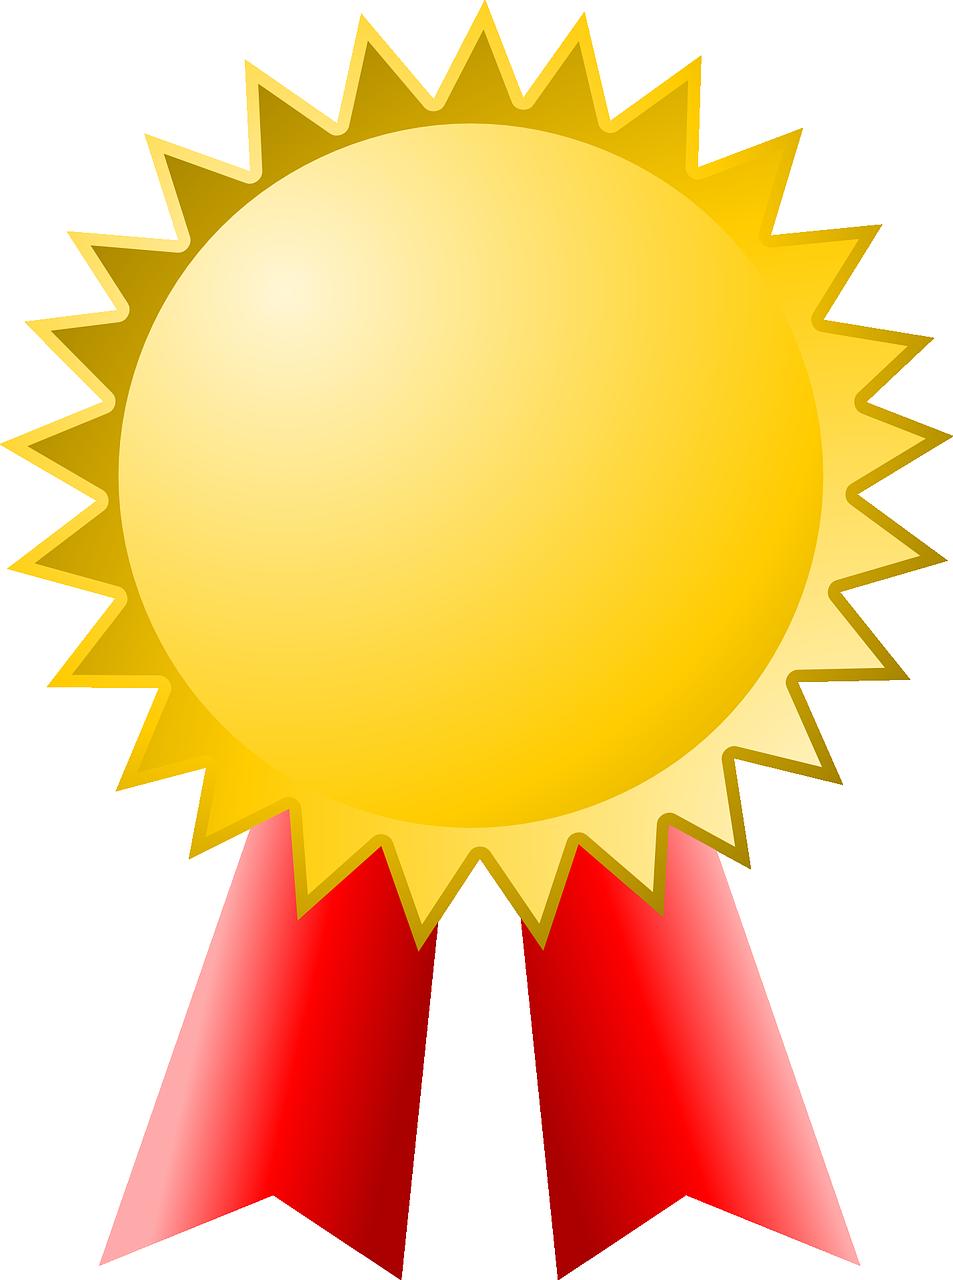 4 More Award Winning Long Term Care Programs.